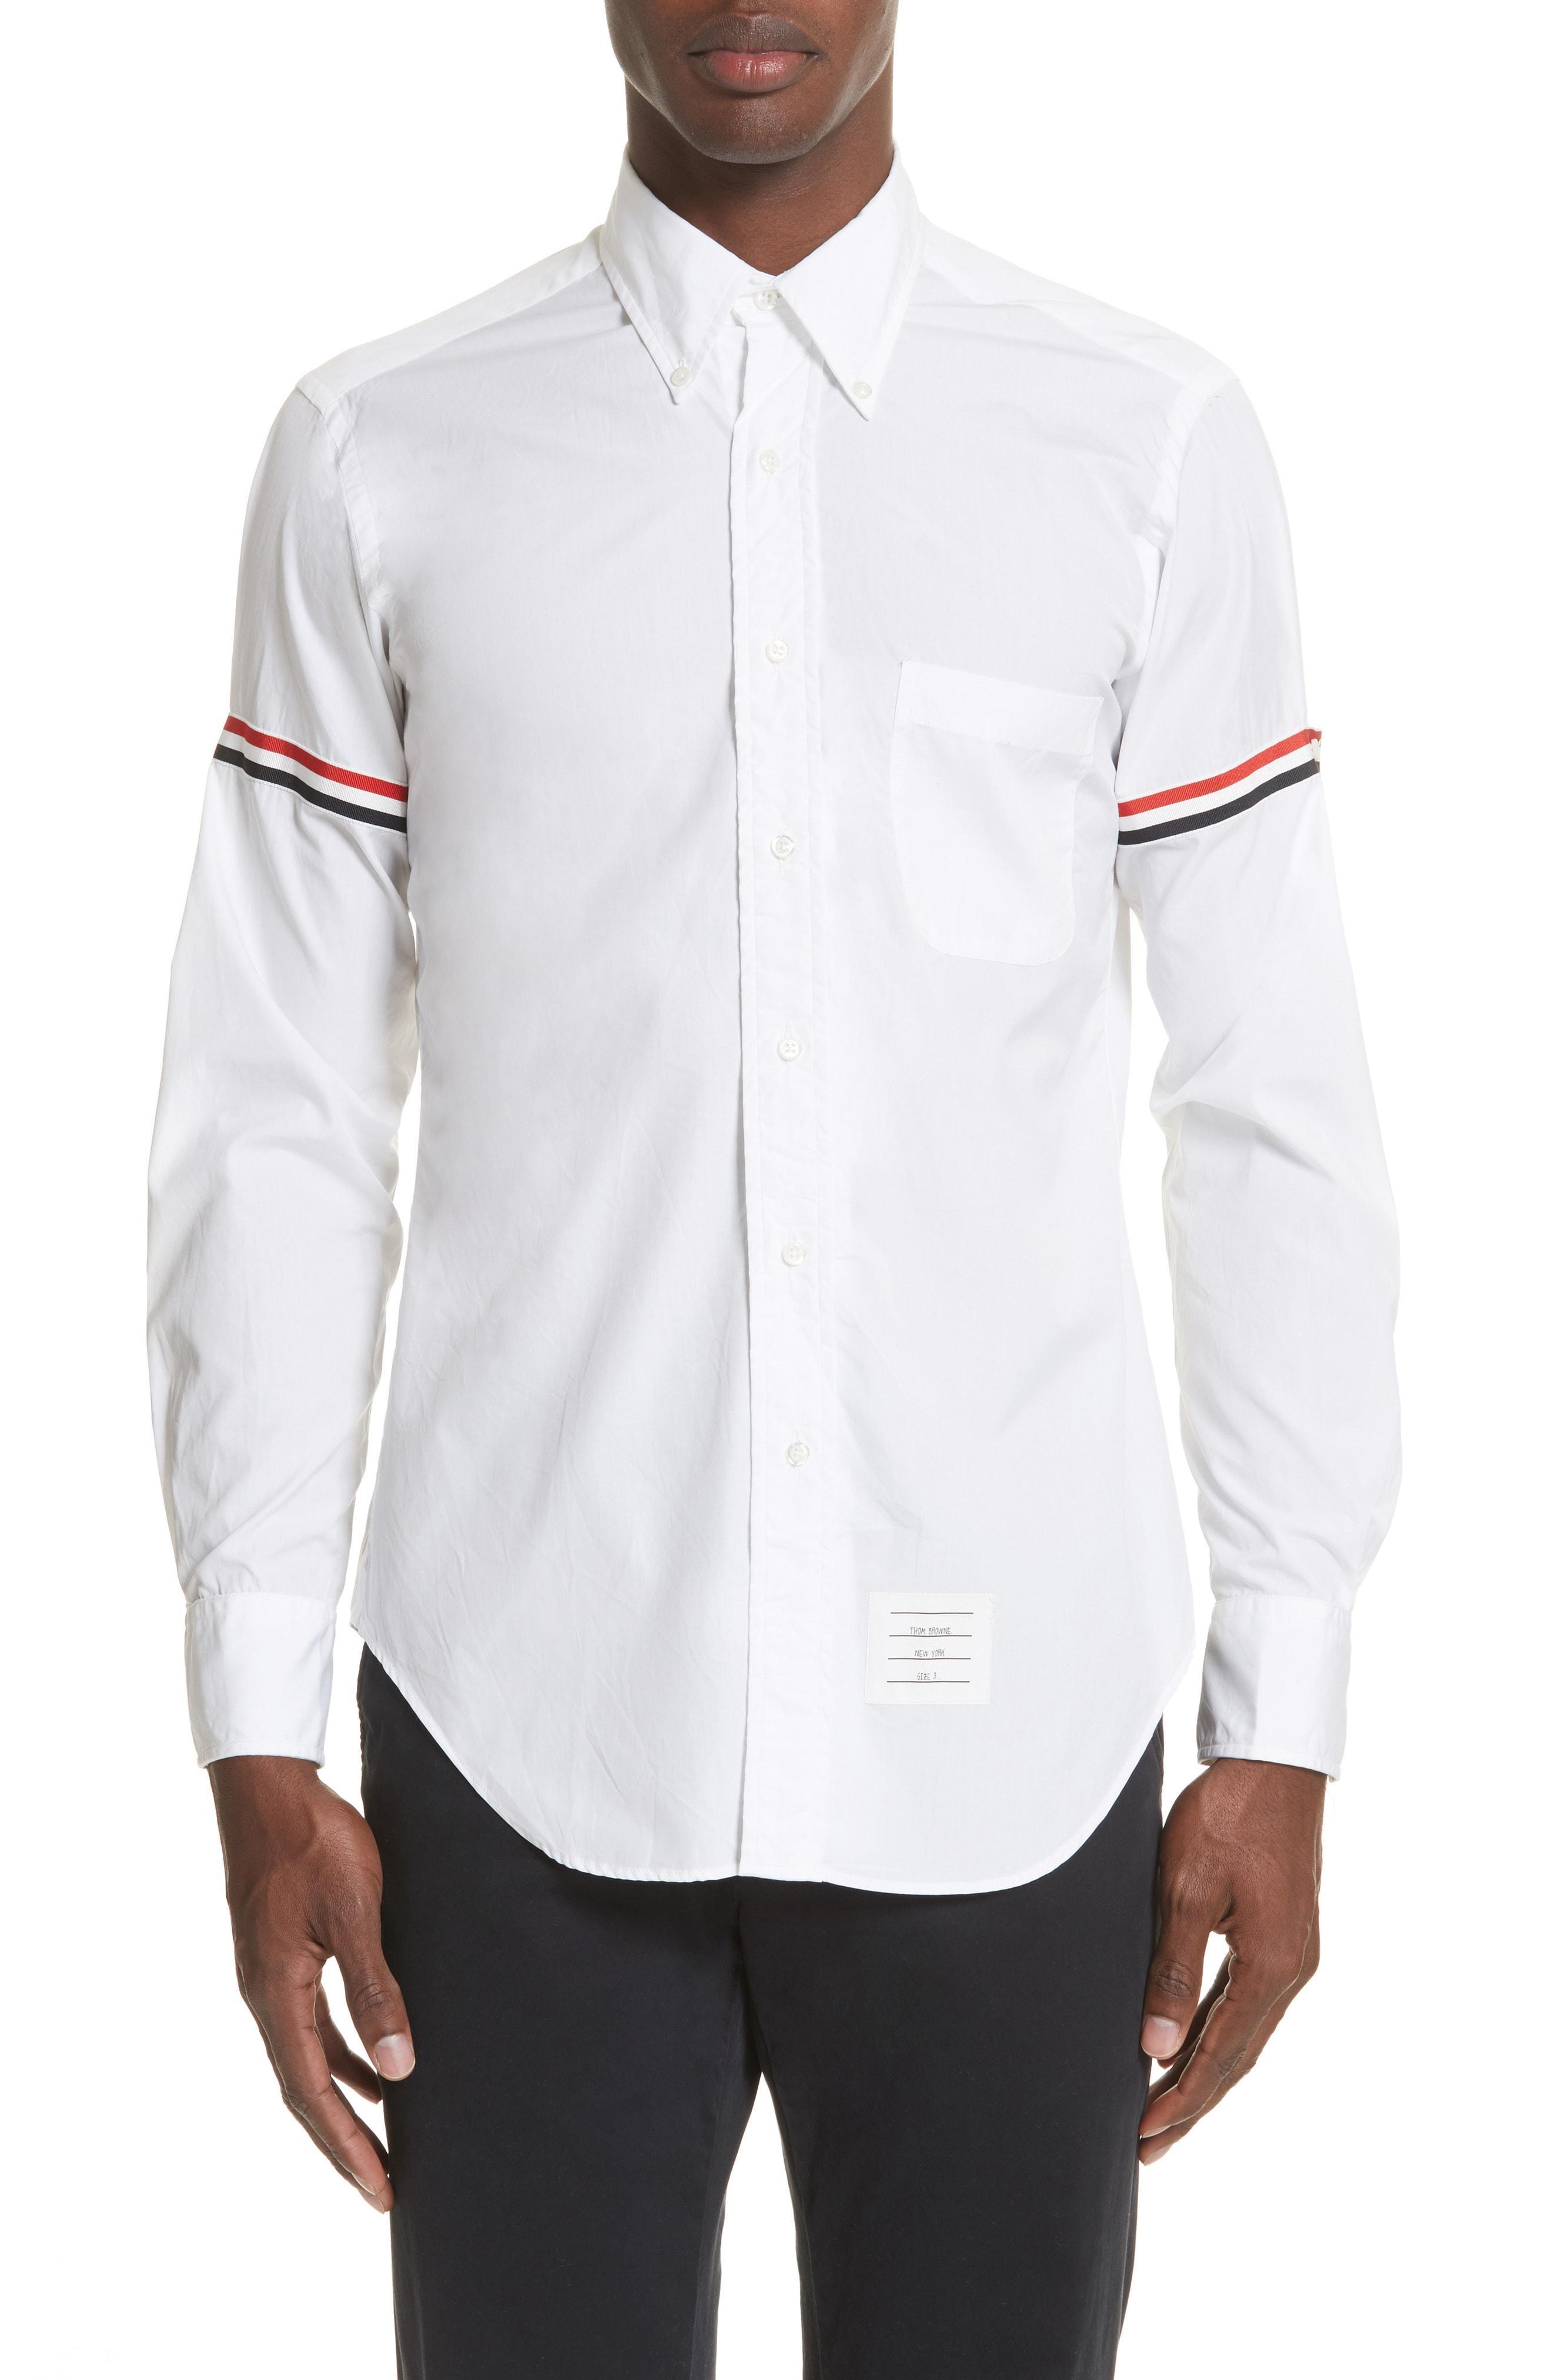 5a182922f089 Thom Browne Slim-Fit Button-Down Collar Grosgrain-Trimmed Cotton Oxford  Shirt -